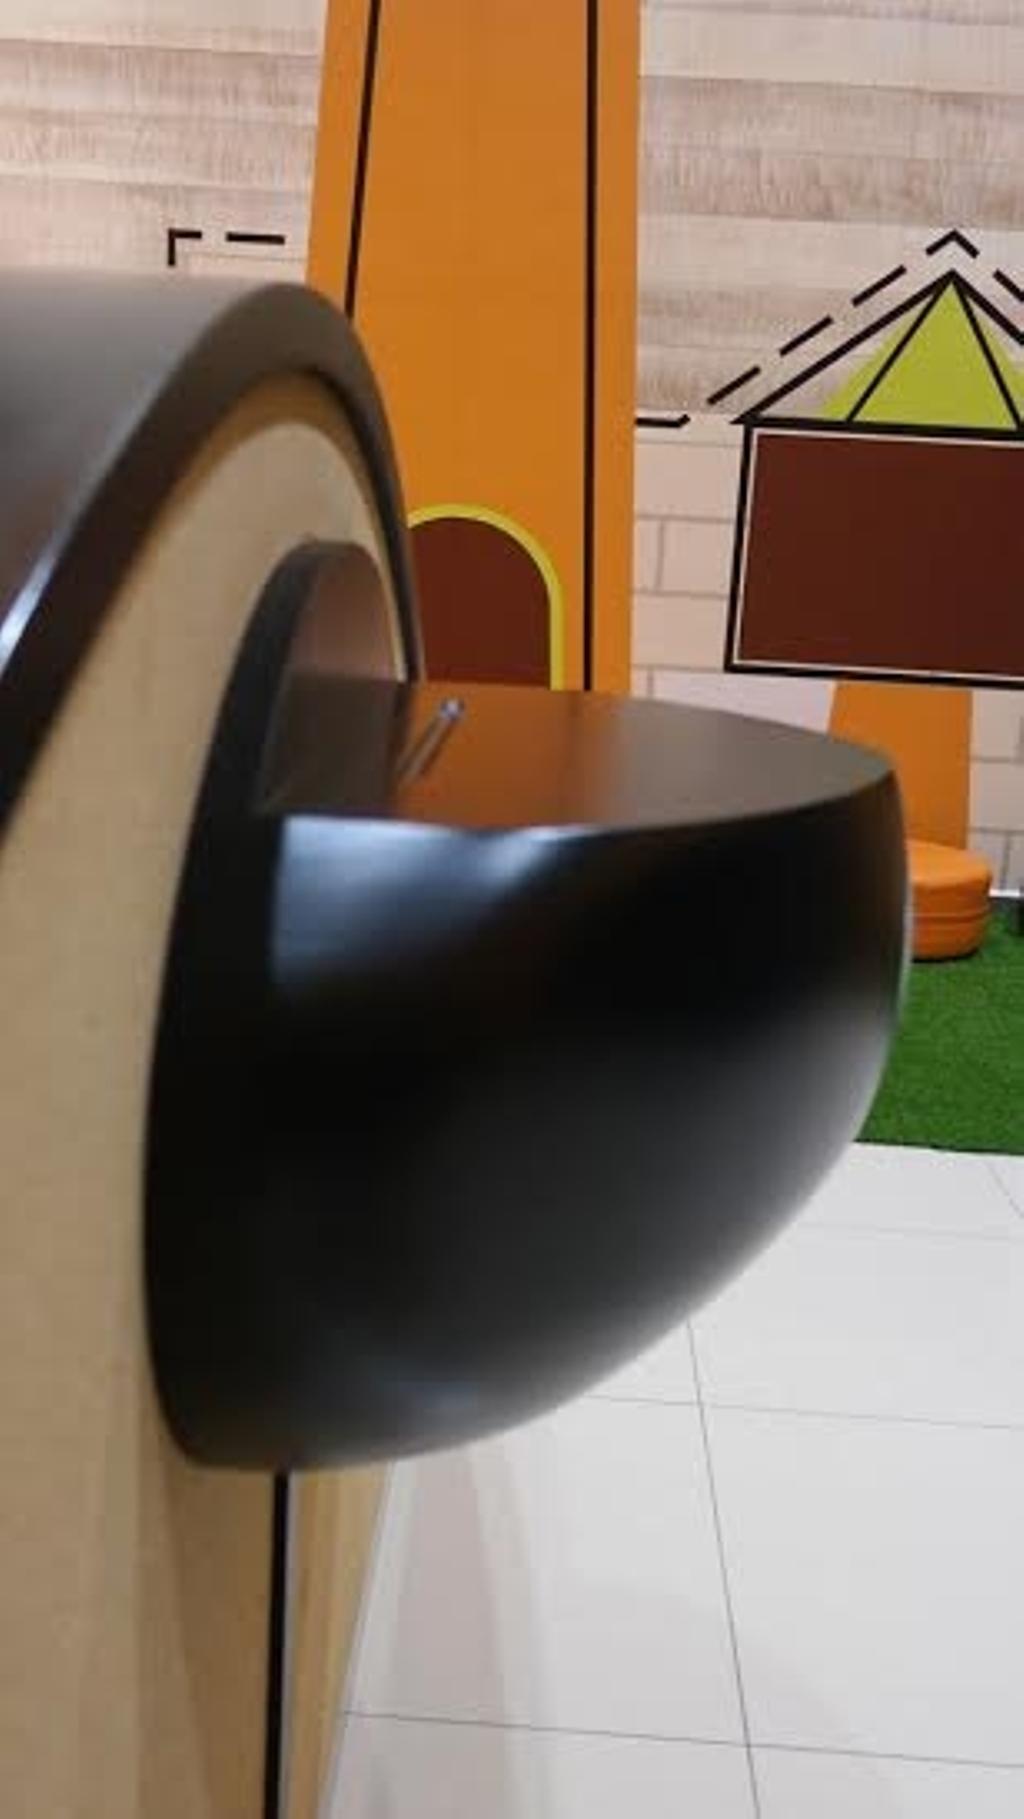 Art Studio Klang, Commercial, Interior Designer, A Moxie Associates Sdn Bhd, Contemporary, Accessories, Bag, Handbag, Purse